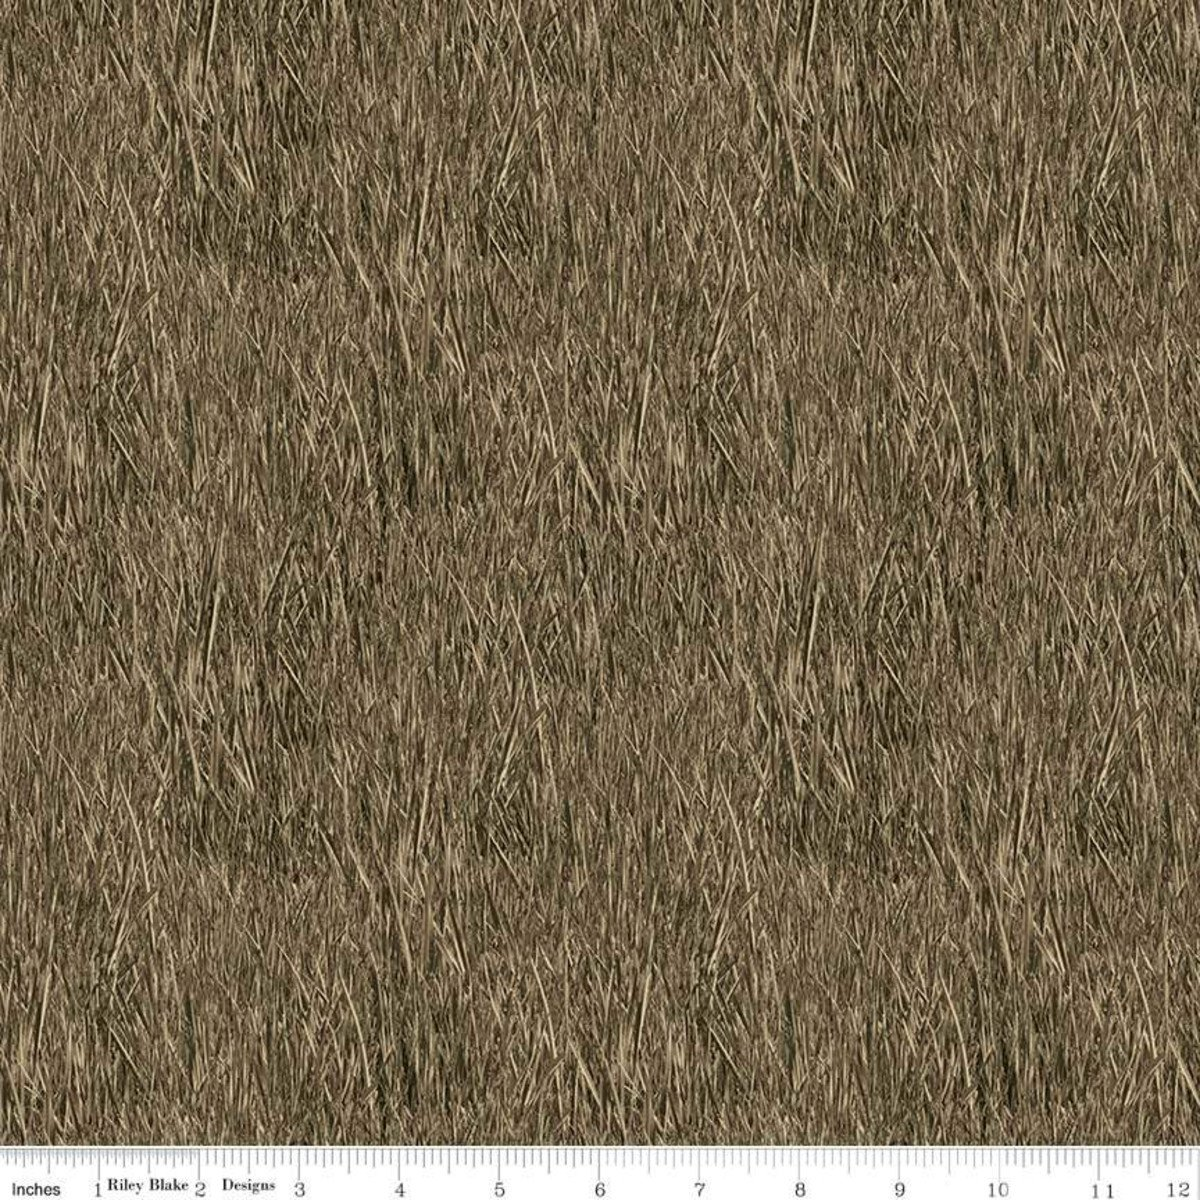 Brown Reeds - Fish and Fowl - C8730-BROWN